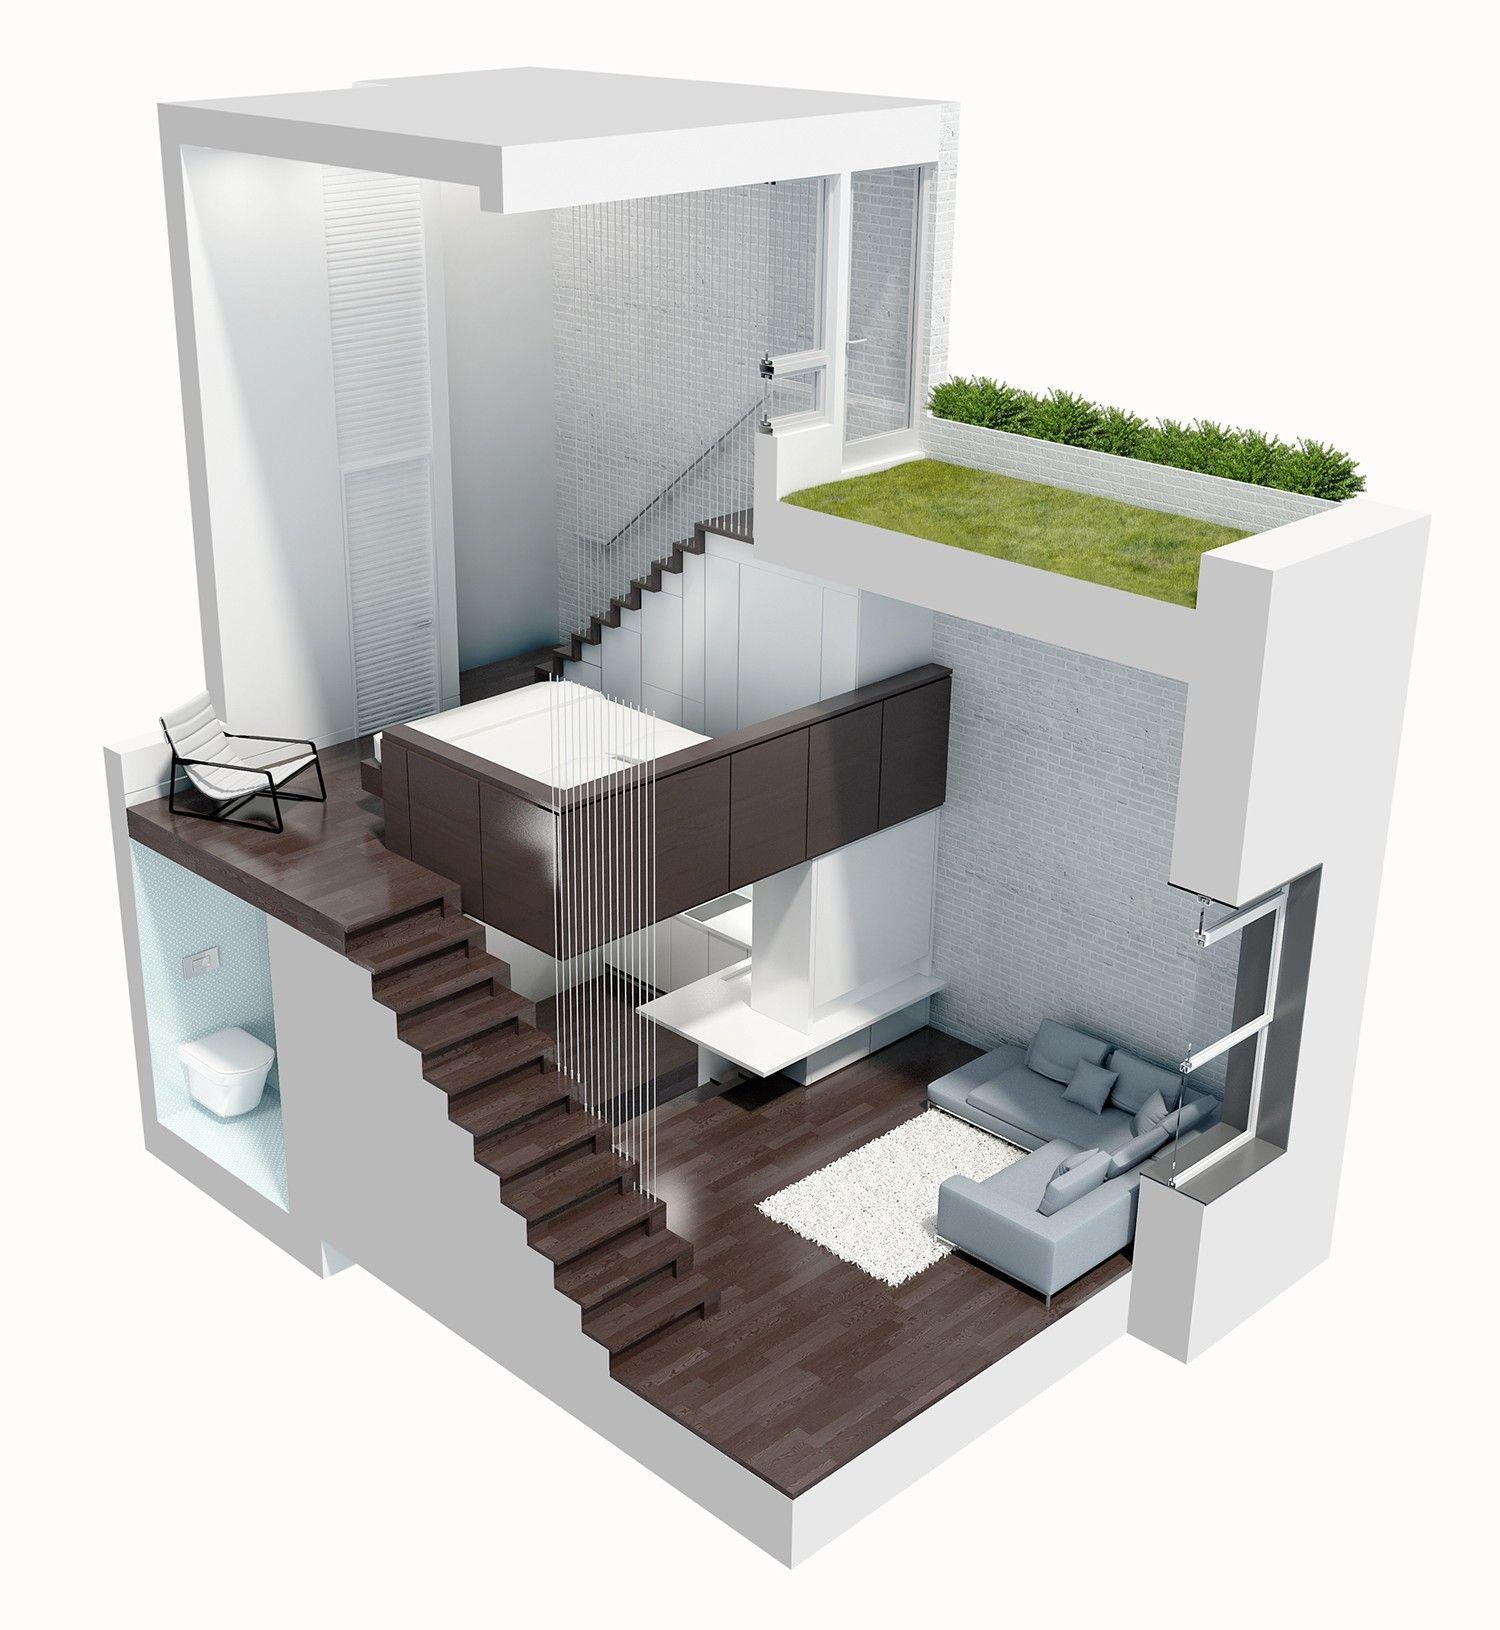 Manhattan New York Studio Apartments: 425 Sq. Ft Urban Studio Loft Apartment Floor Plan